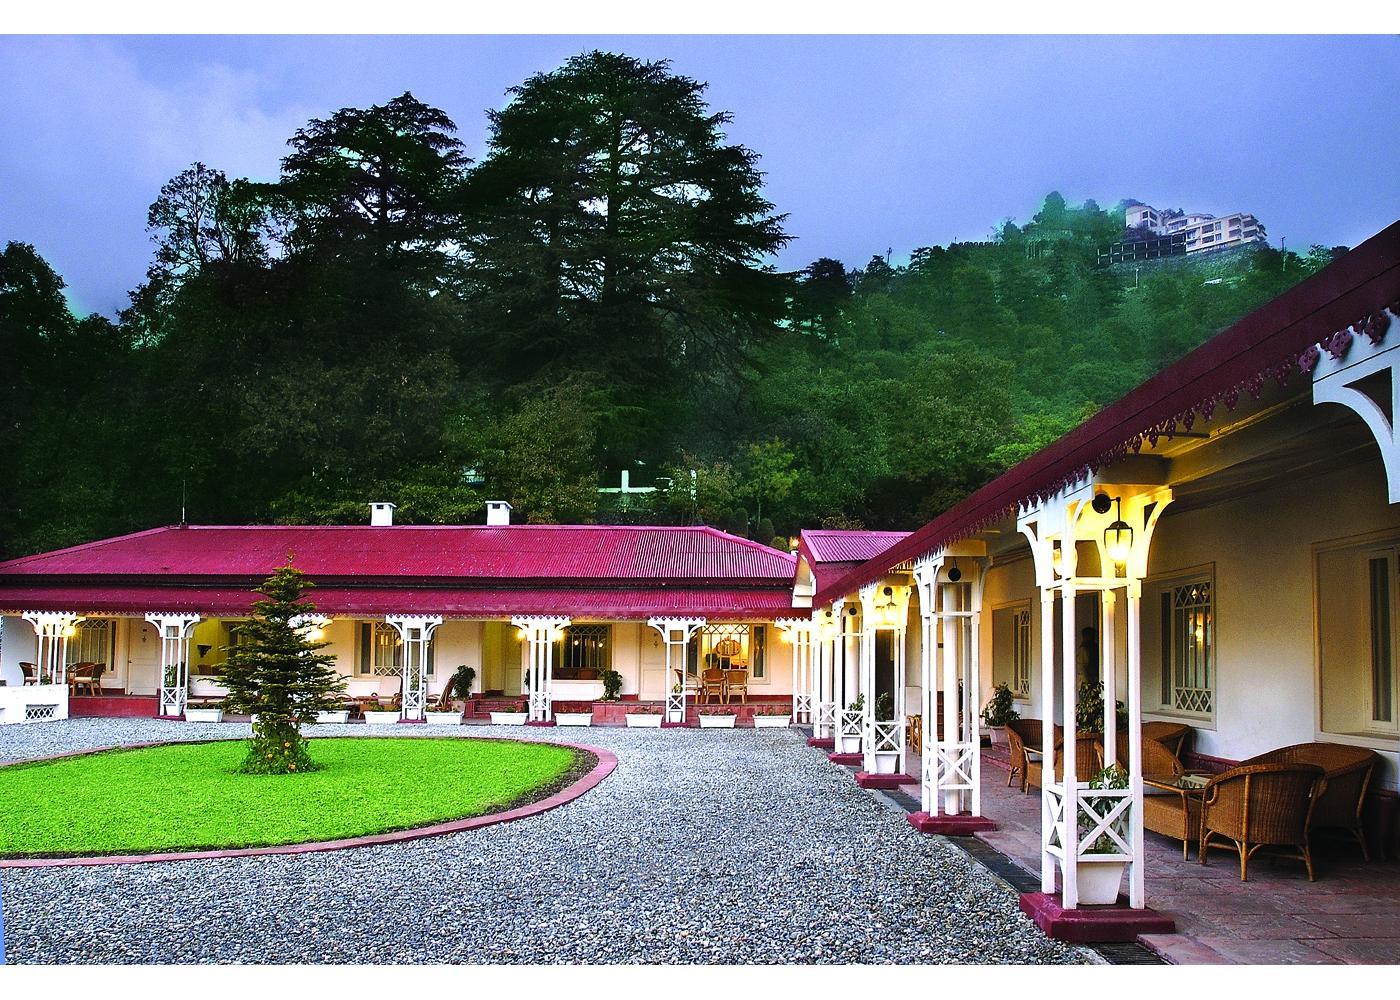 The Claridges Nabha Residence, Mussoorie